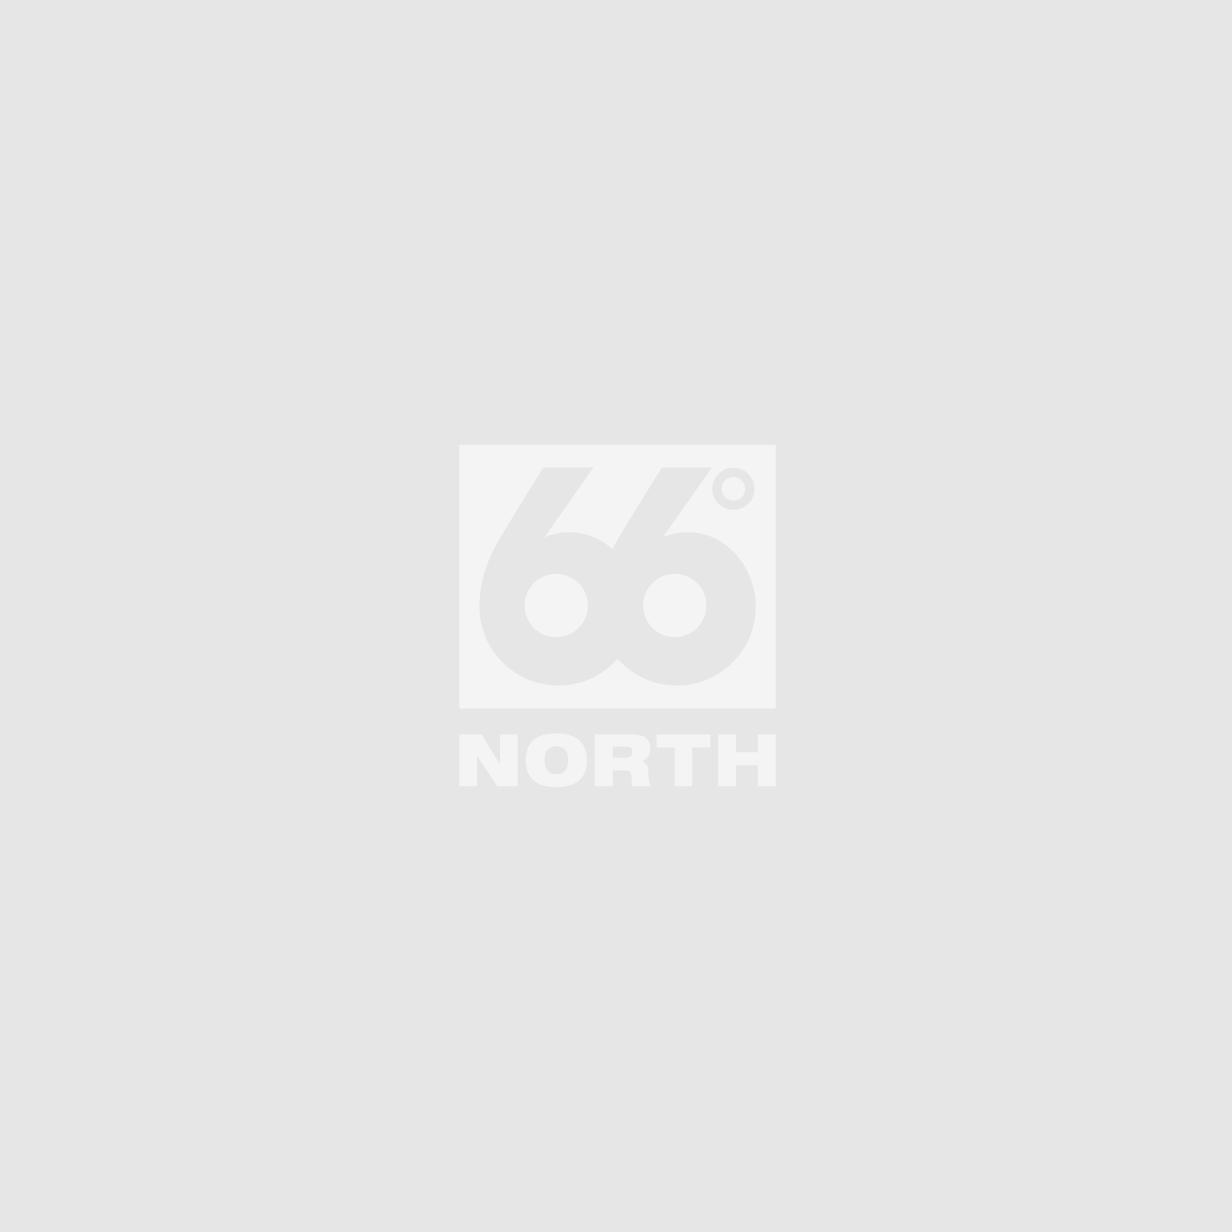 66 North Women's Borgir Bottoms - Black - 2xl